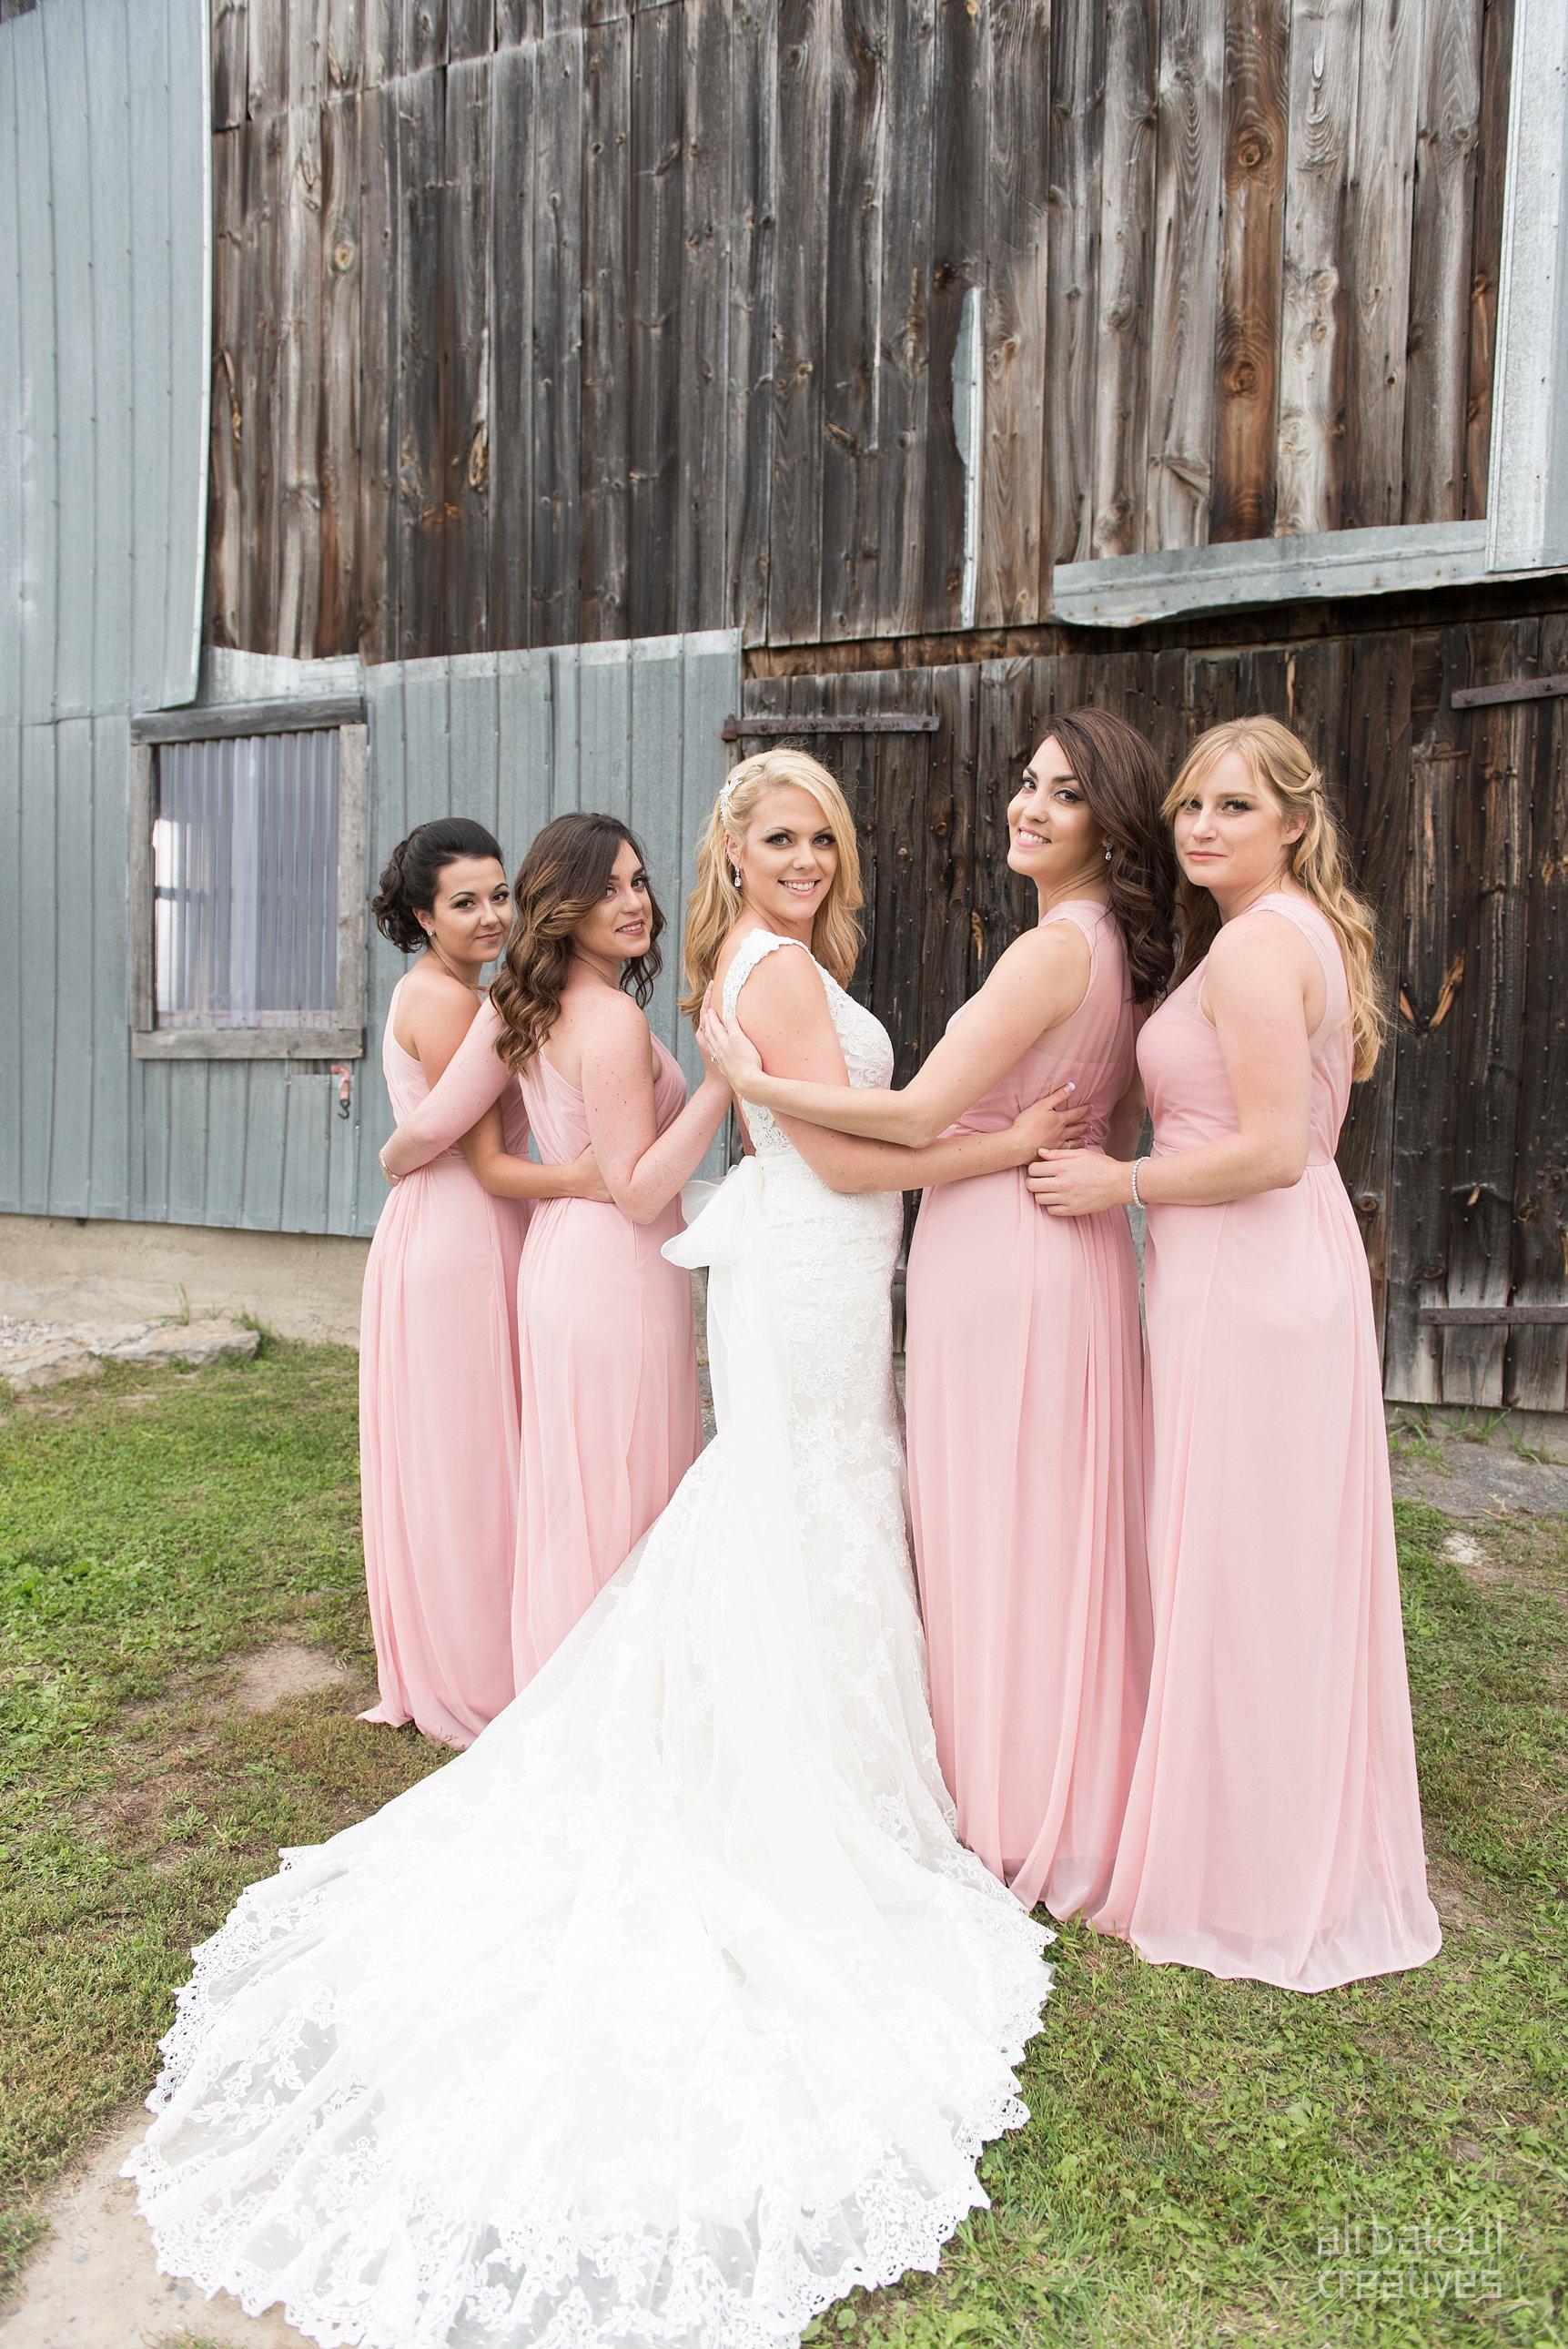 Samer + Brittany Barn Wedding - Ali Batoul Creatives (blog)-55_Stomped.jpg